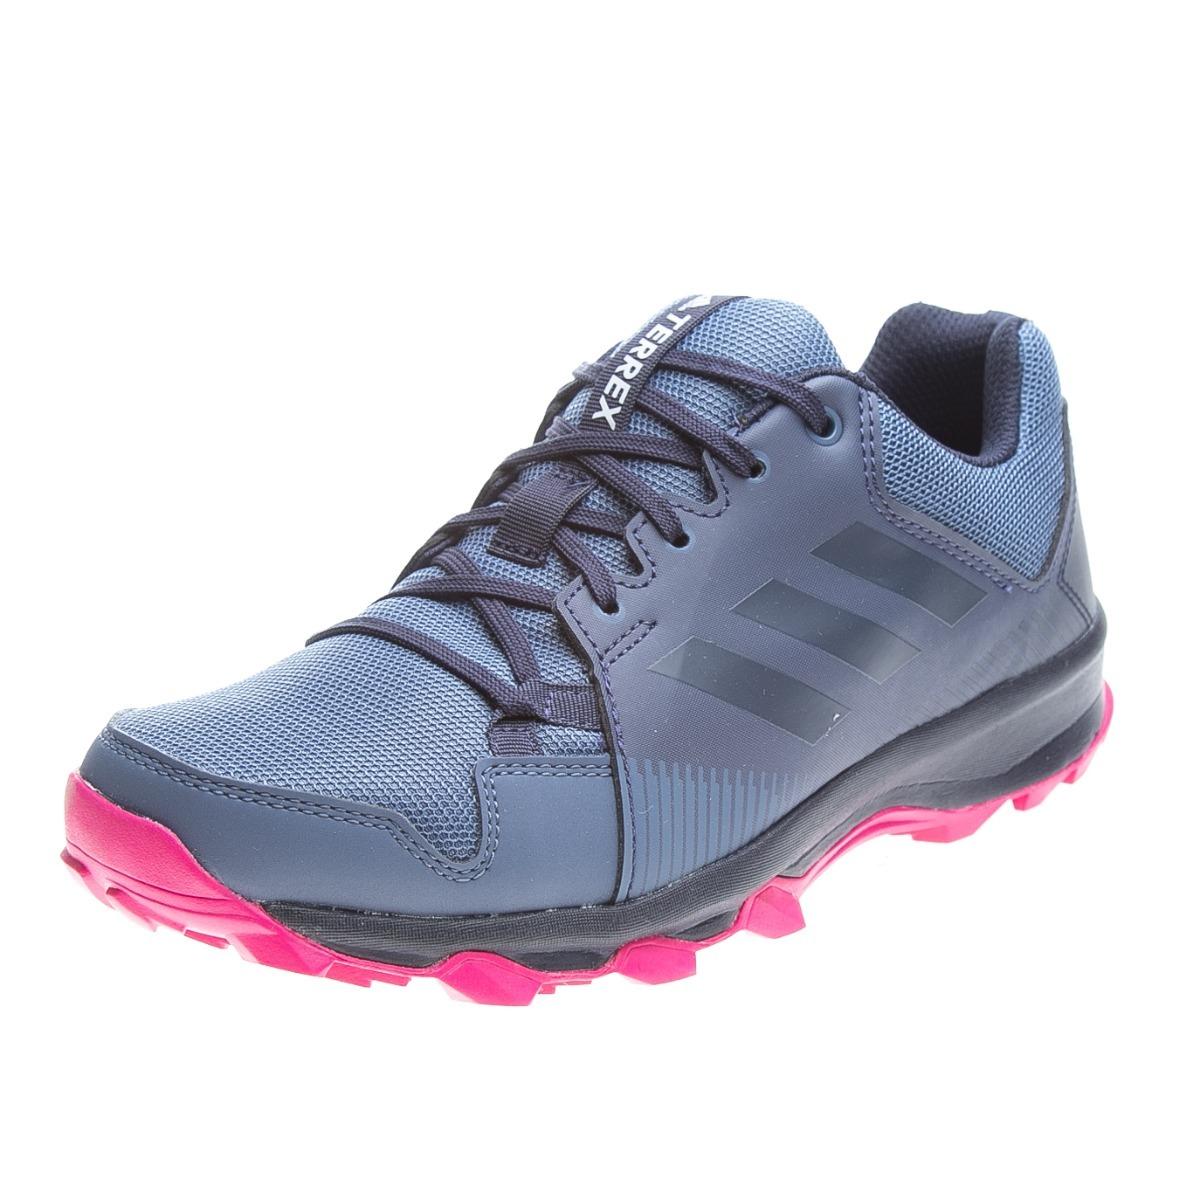 best service 2070c d81aa zapatilla adidas terrex tracerocker w. Cargando zoom.